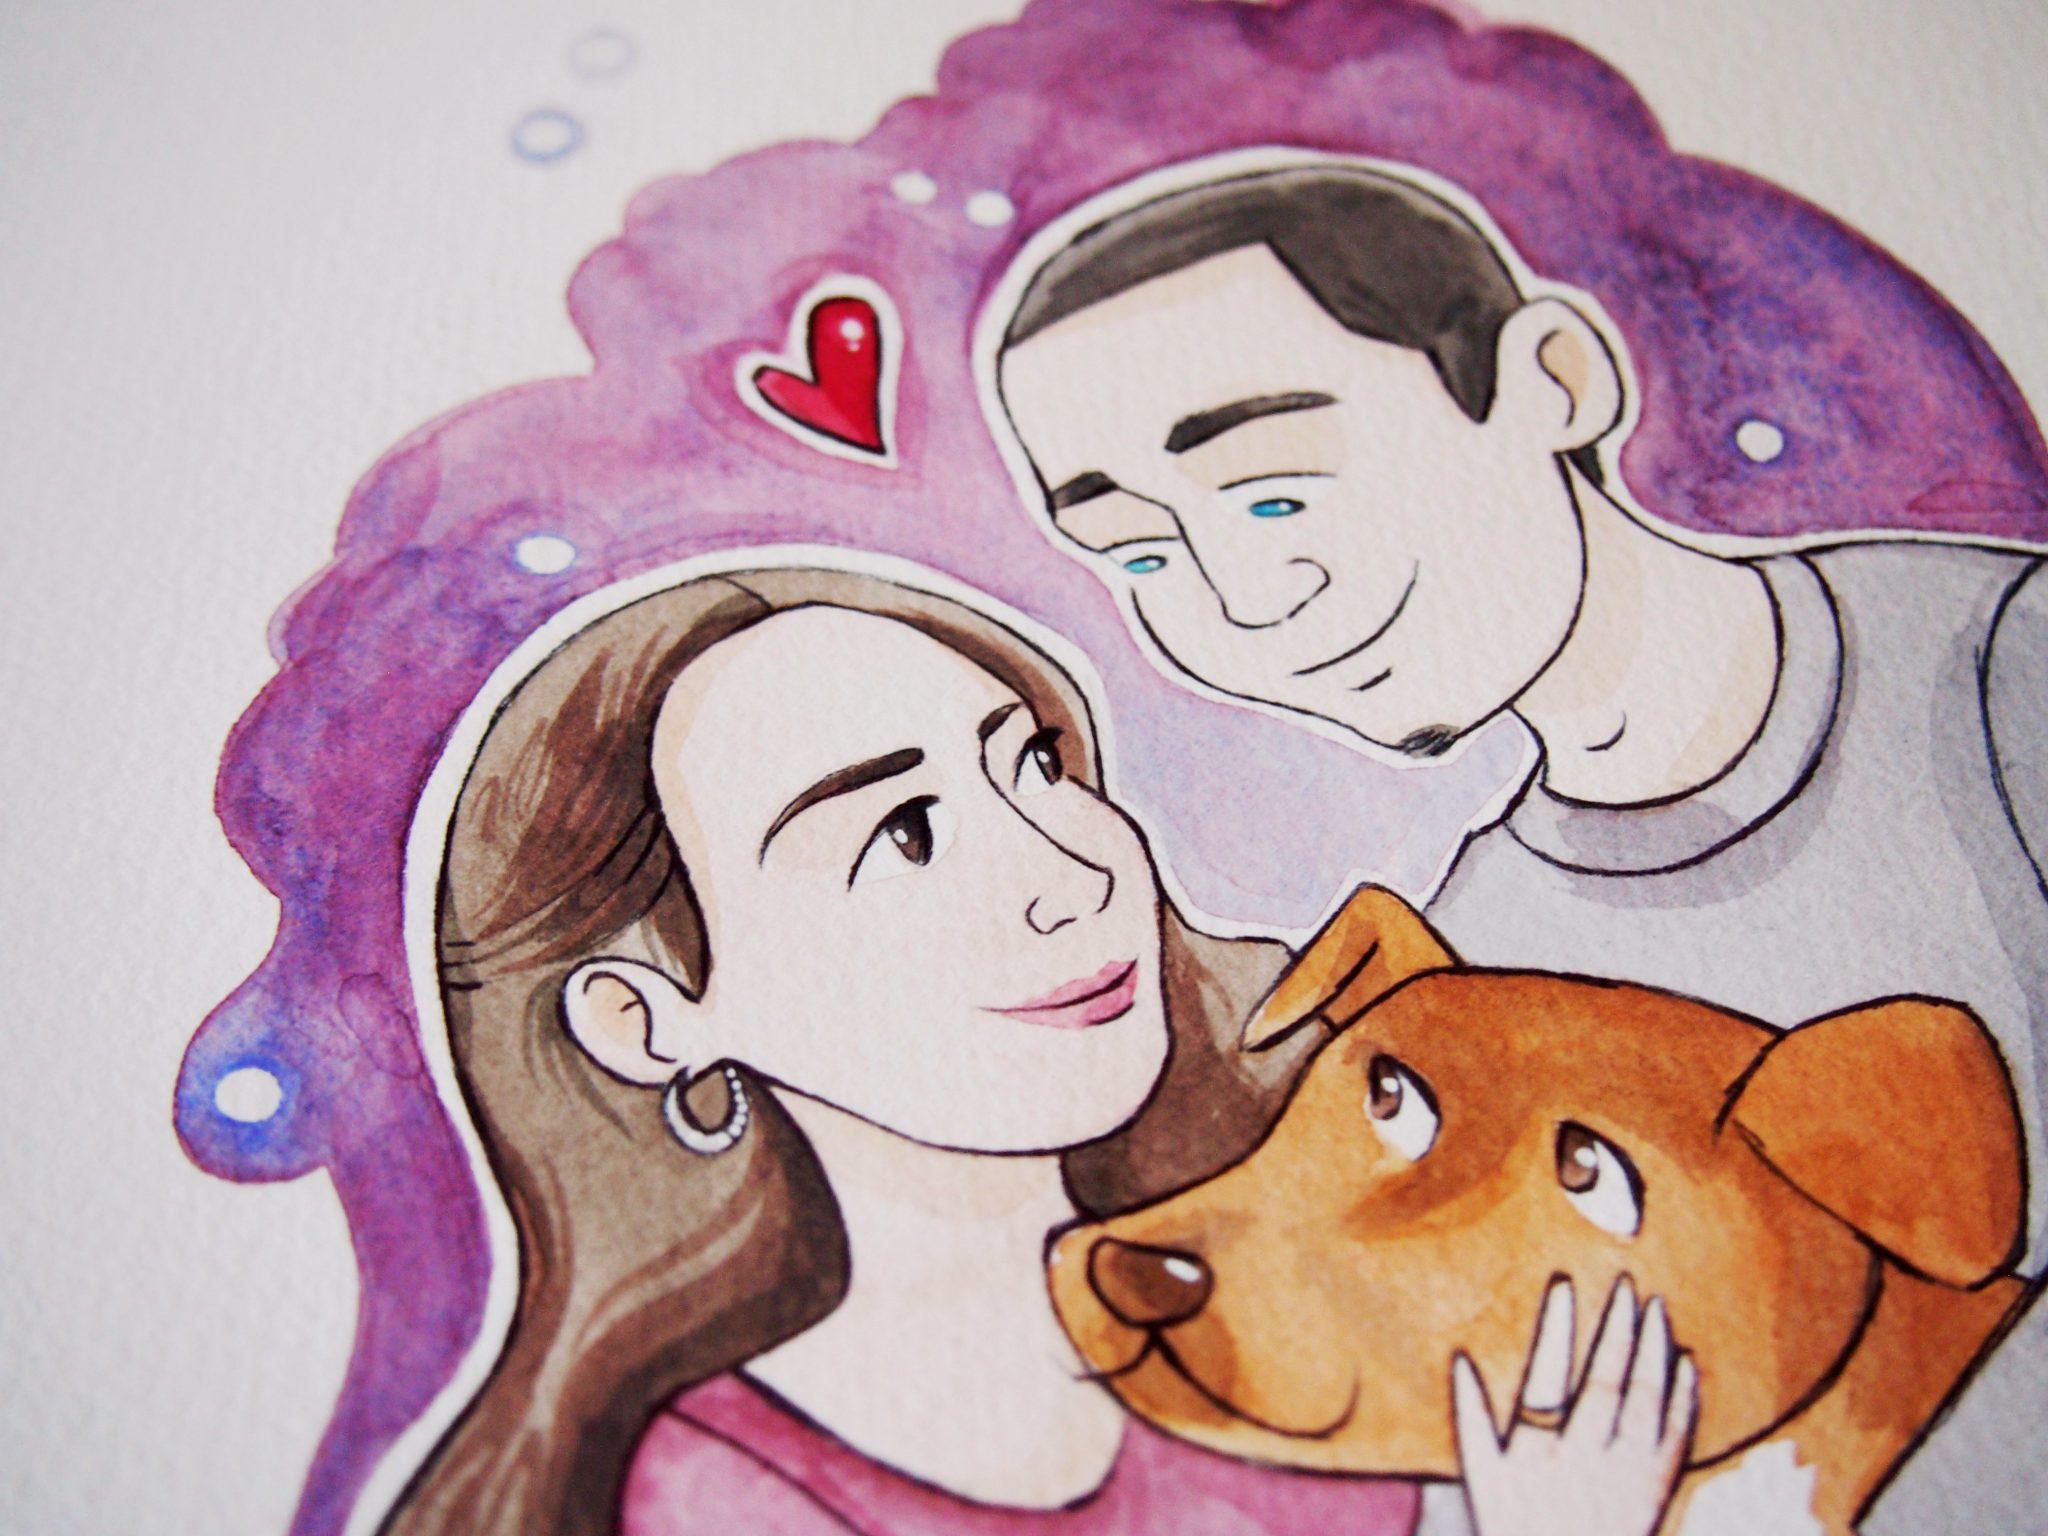 custom portrait, ritratto, custom couple portrait, personalized portrait, custom portrait anniversary, ritratto illustrato, ritratto personalizzato, ritratto di coppia, ritratto illustrazione anniversario